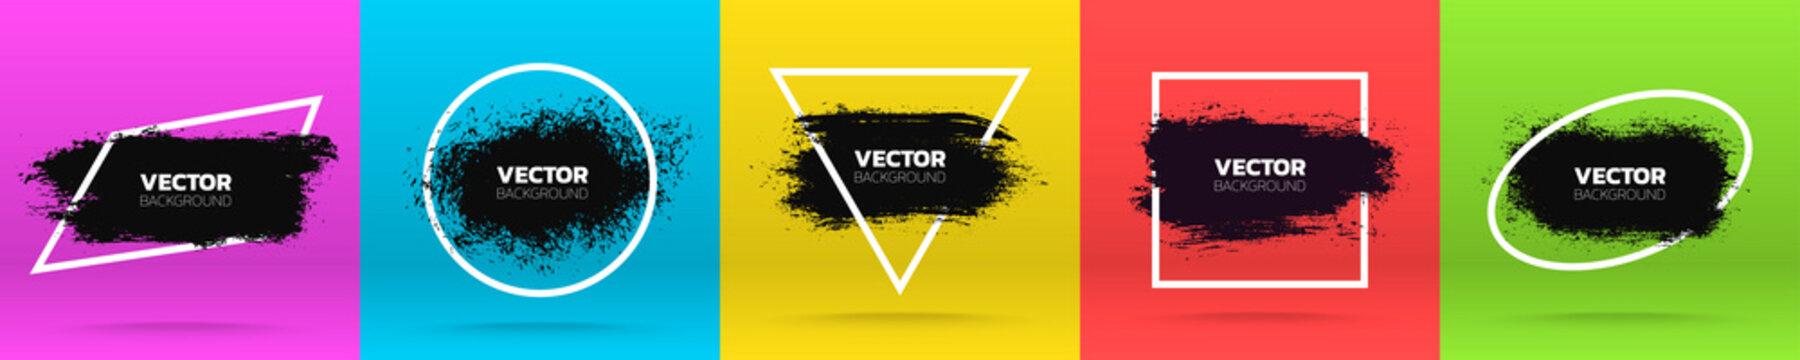 Grunge backgrounds set. Brush black paint ink stroke over various frame. Vector illustration